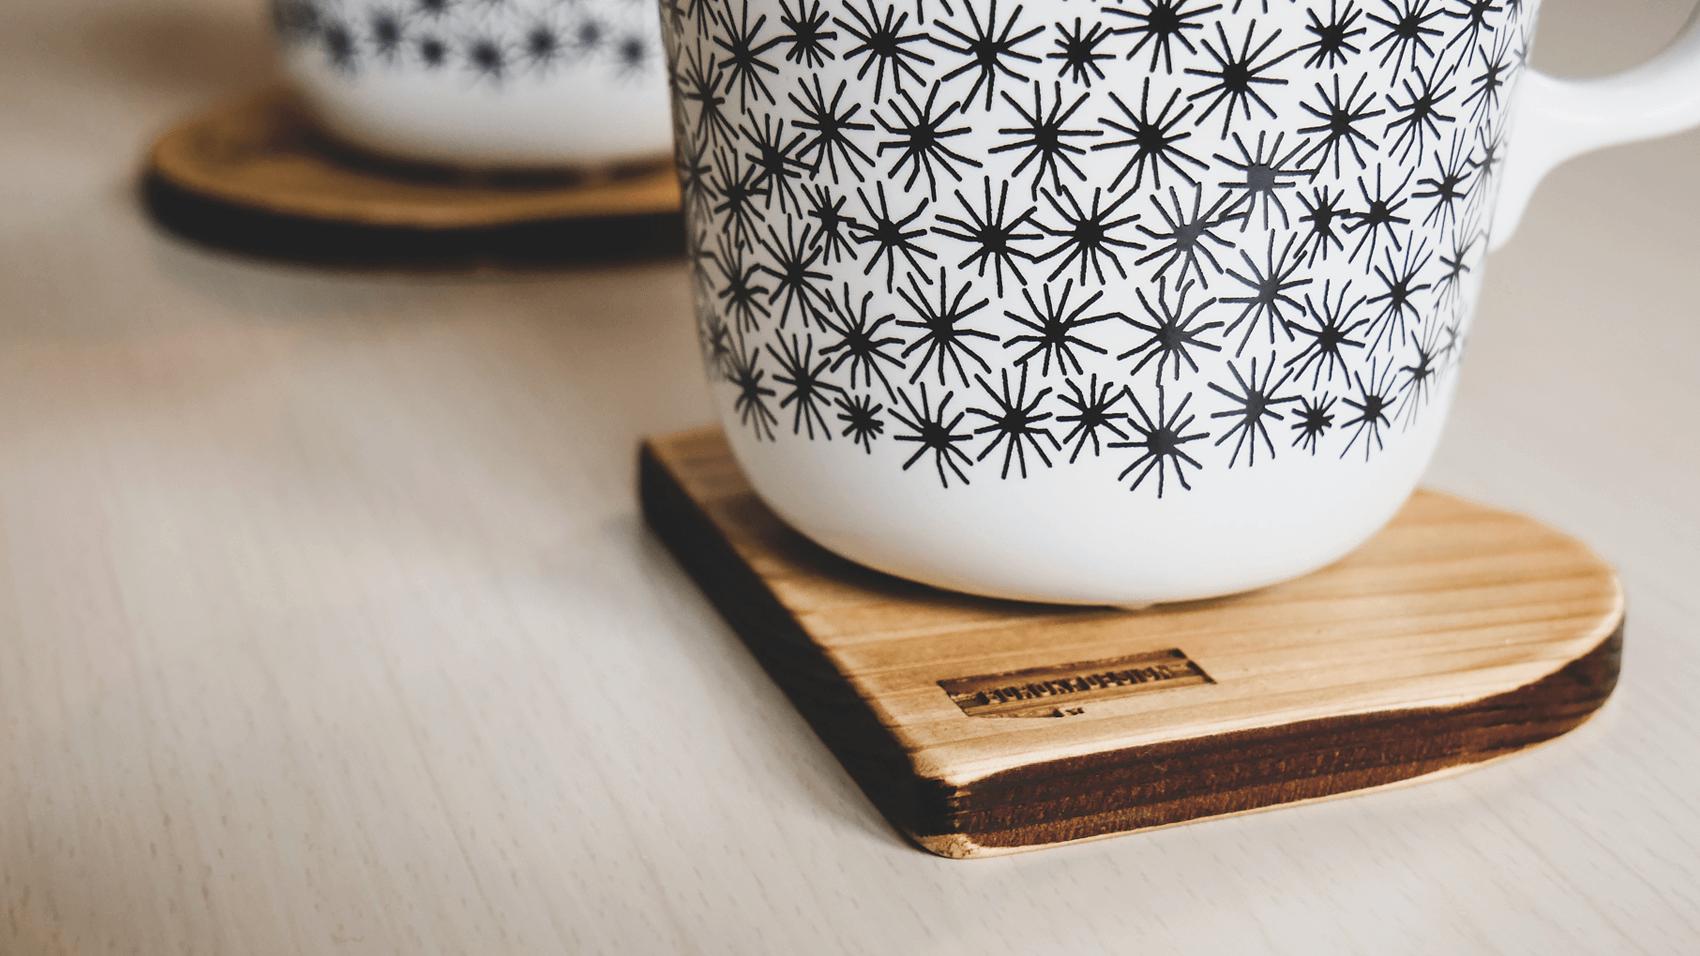 BUROKI design開業1周年を記念したオリジナル木製コースターセット